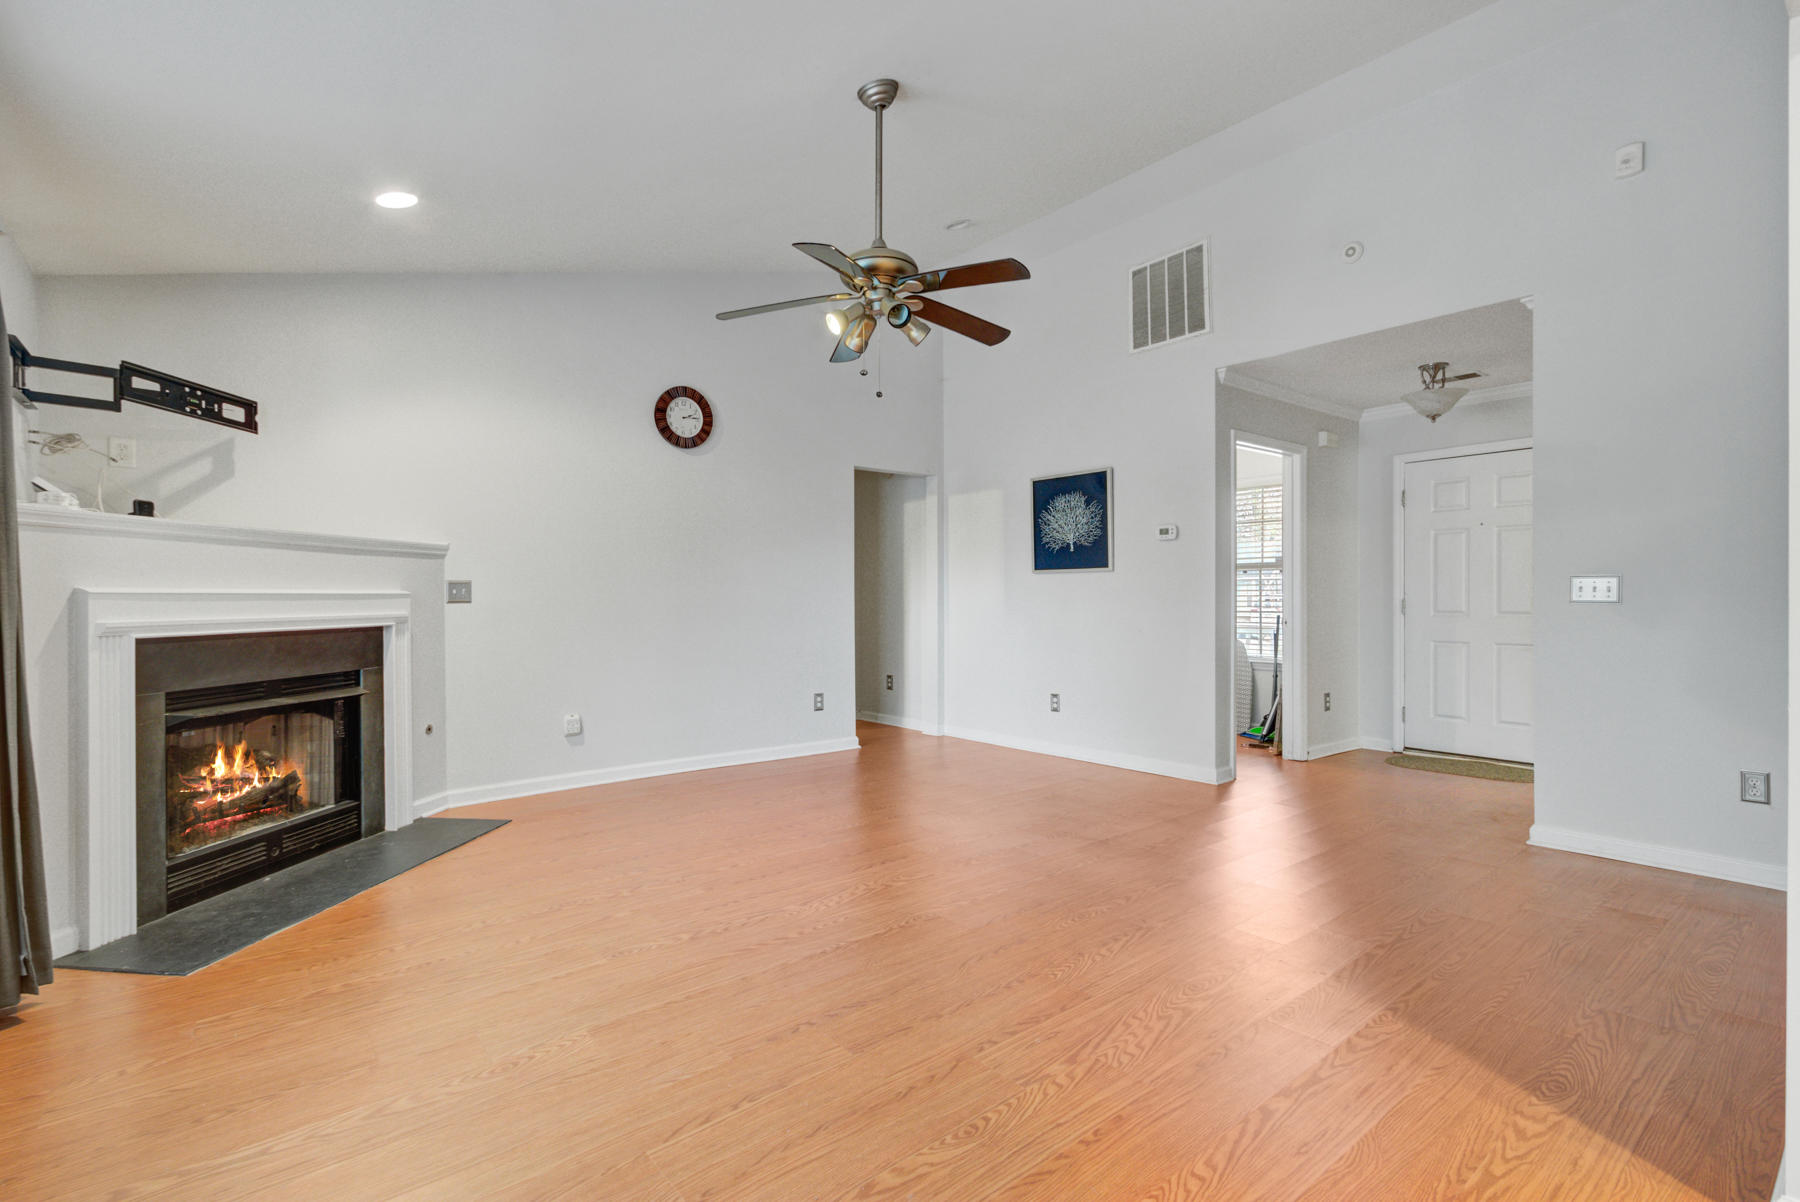 Grand Oaks Plantation Homes For Sale - 564 Hainesworth, Charleston, SC - 11